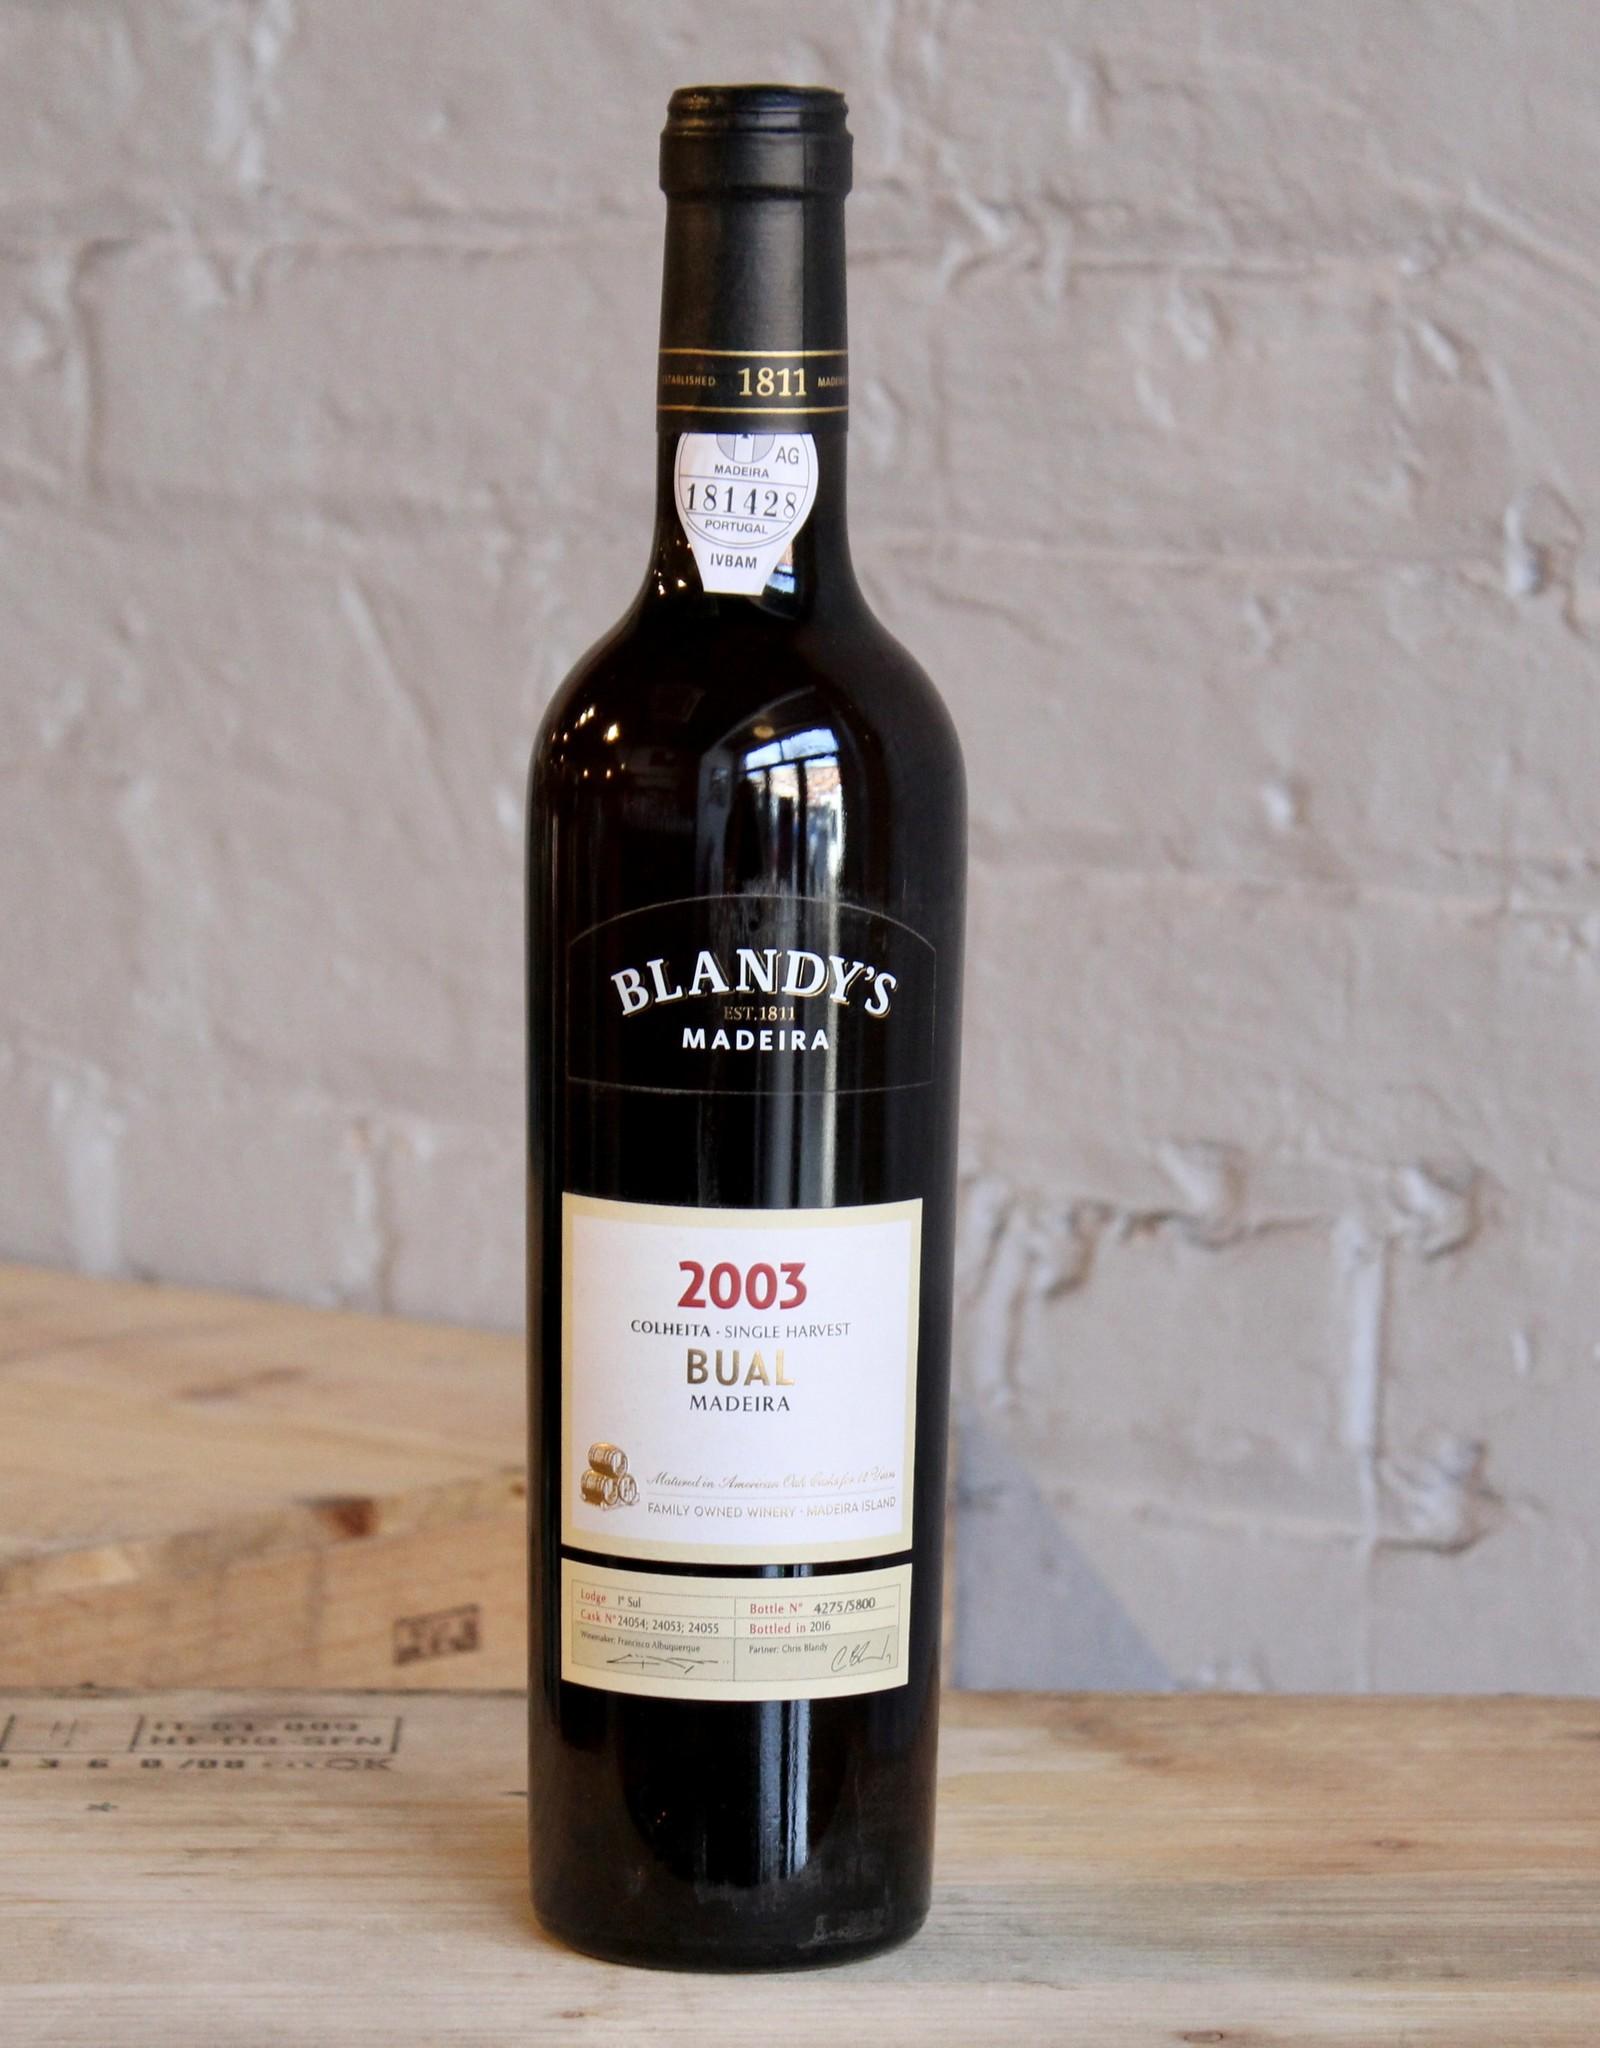 Wine 2003 Blandy's Bual Colheita - Madeira, Portugal (500ml)